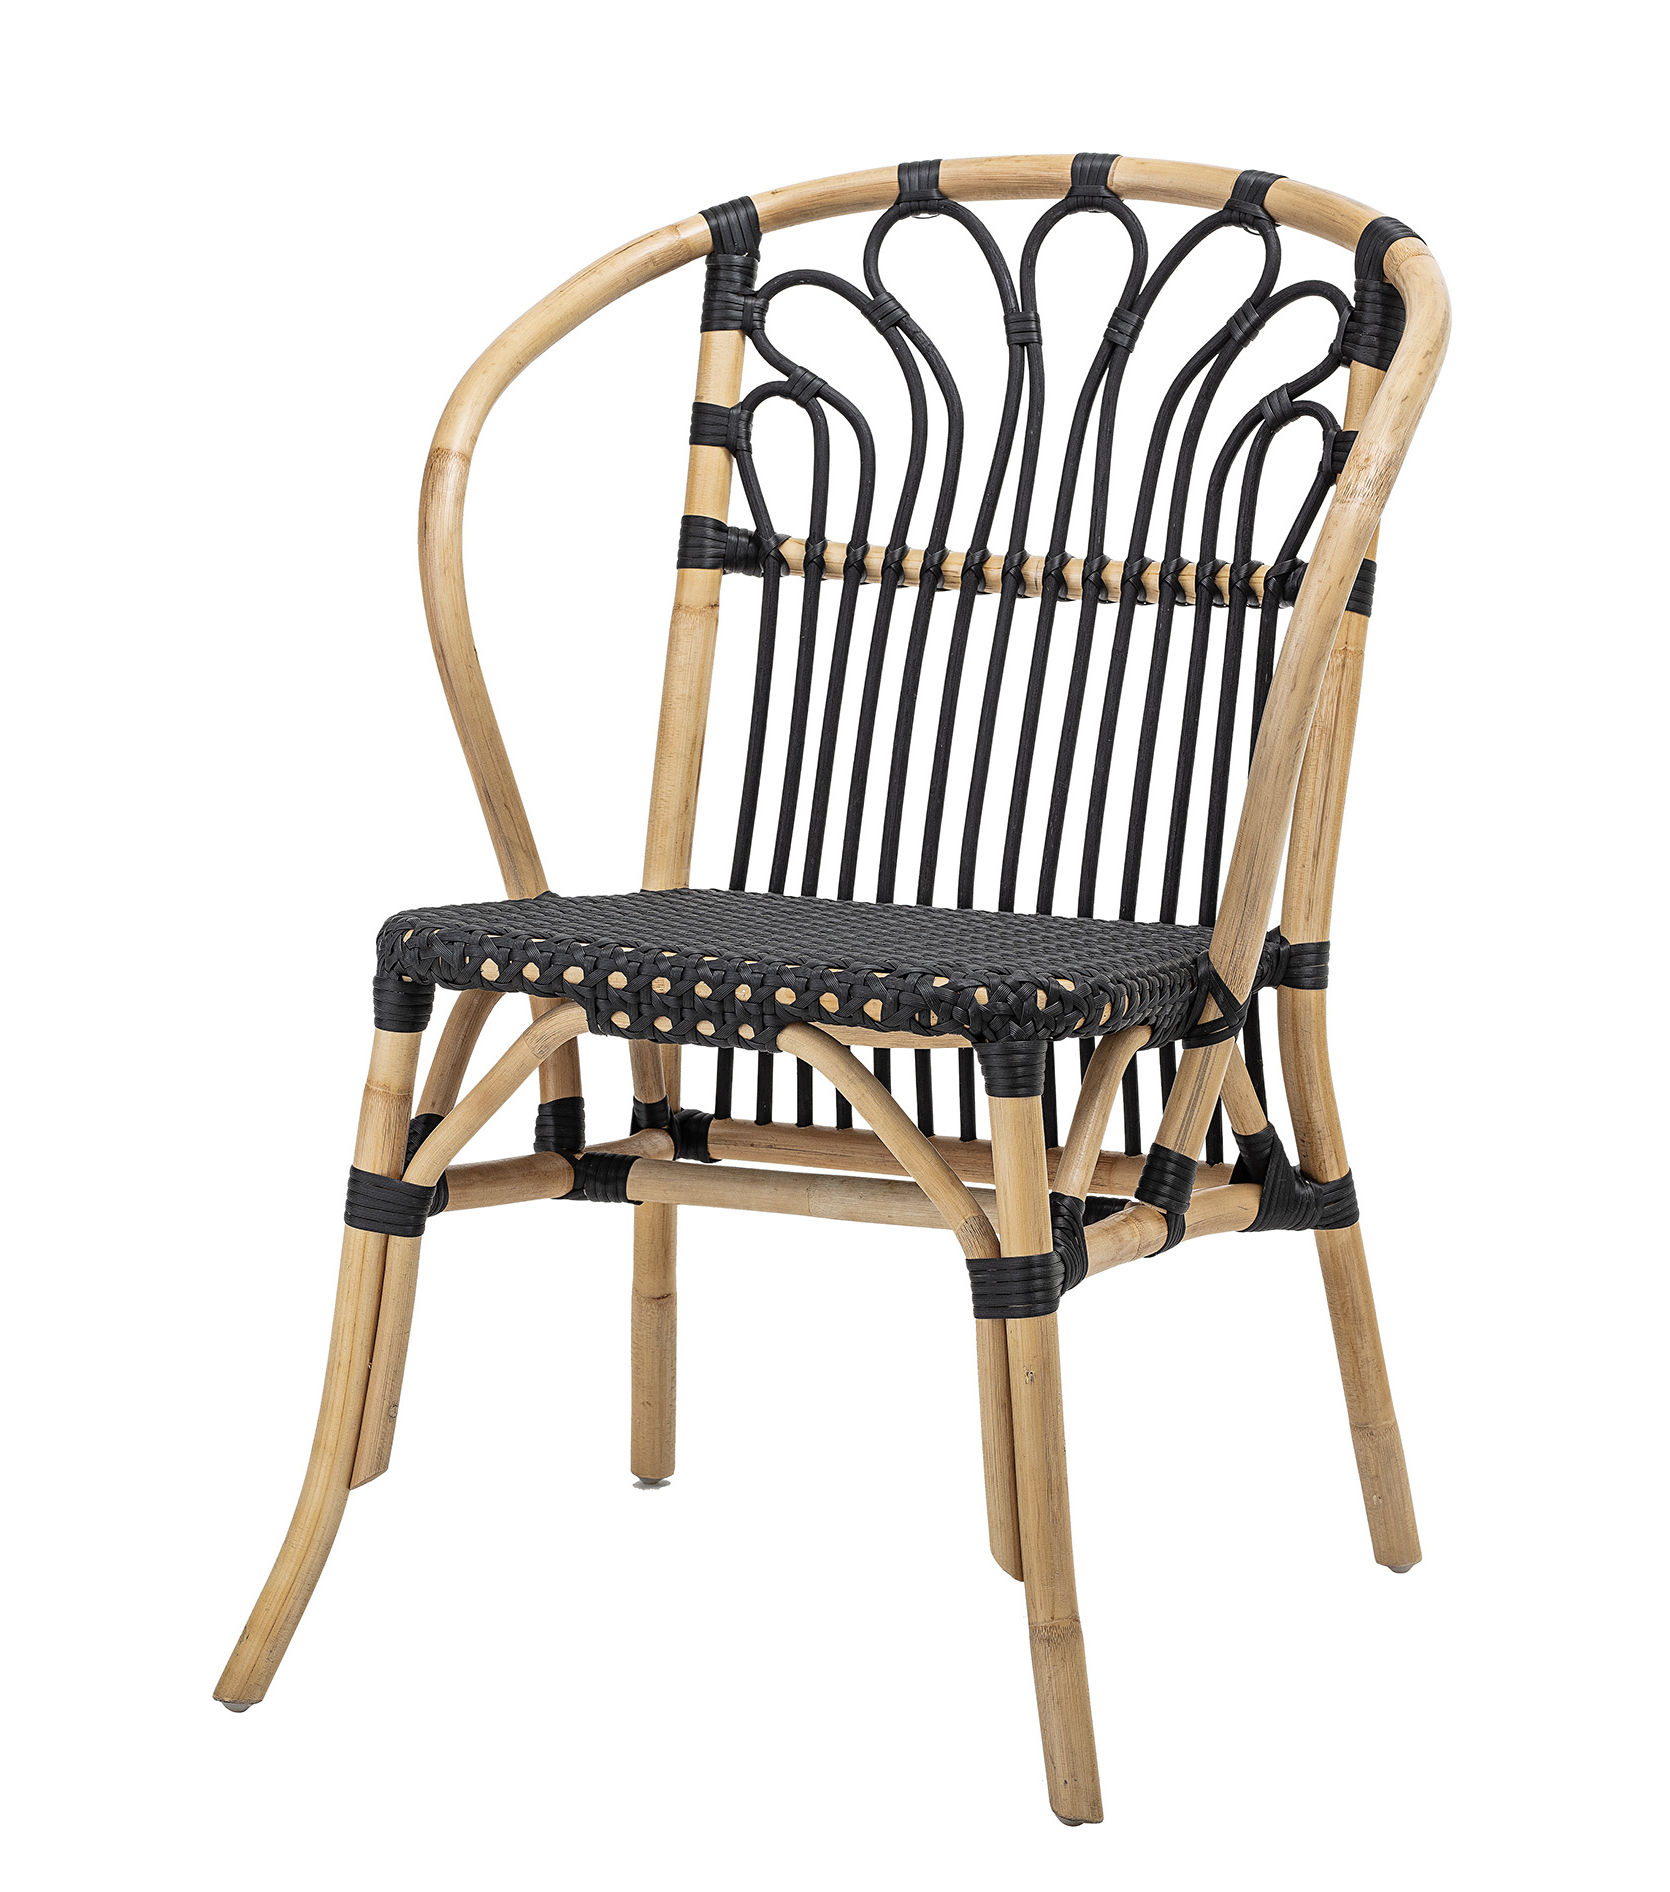 Möbel - Stühle  - Sessel / Rattan - Bloomingville - Schwarz & Natur - Rattan